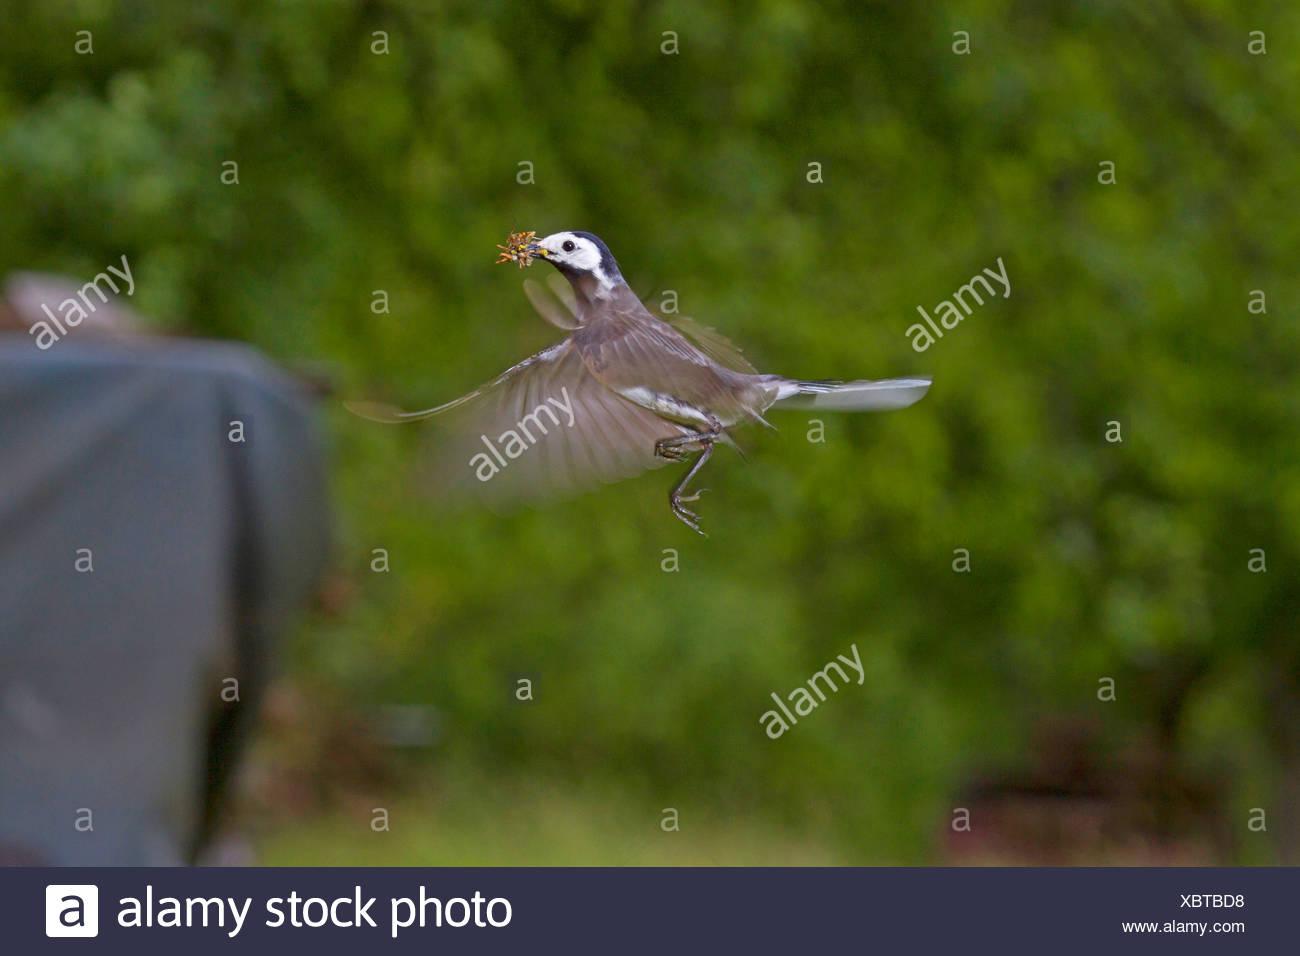 pied wagtail (Motacilla alba), flying with prey in its beak, Germany, Baden-Wuerttemberg Stock Photo